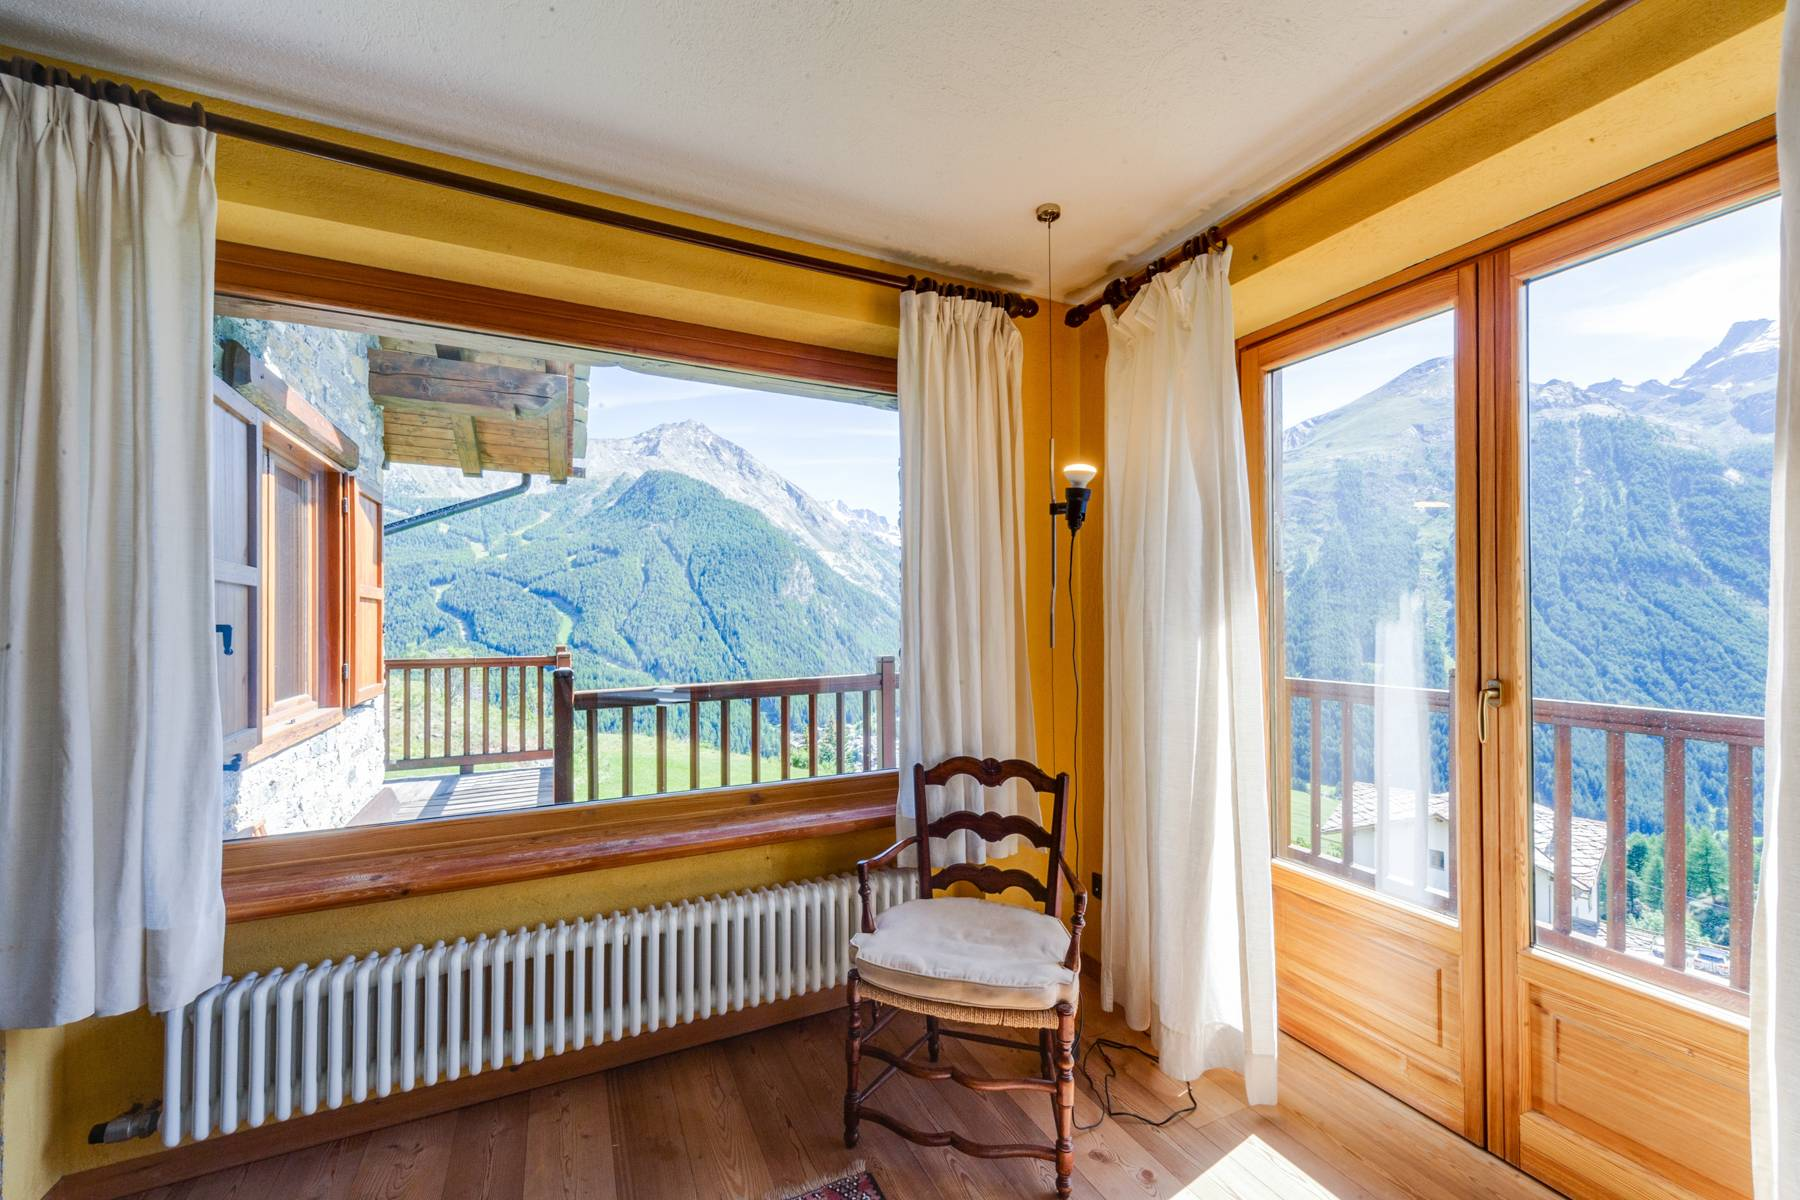 Villa in Vendita a Cogne: 5 locali, 377 mq - Foto 25